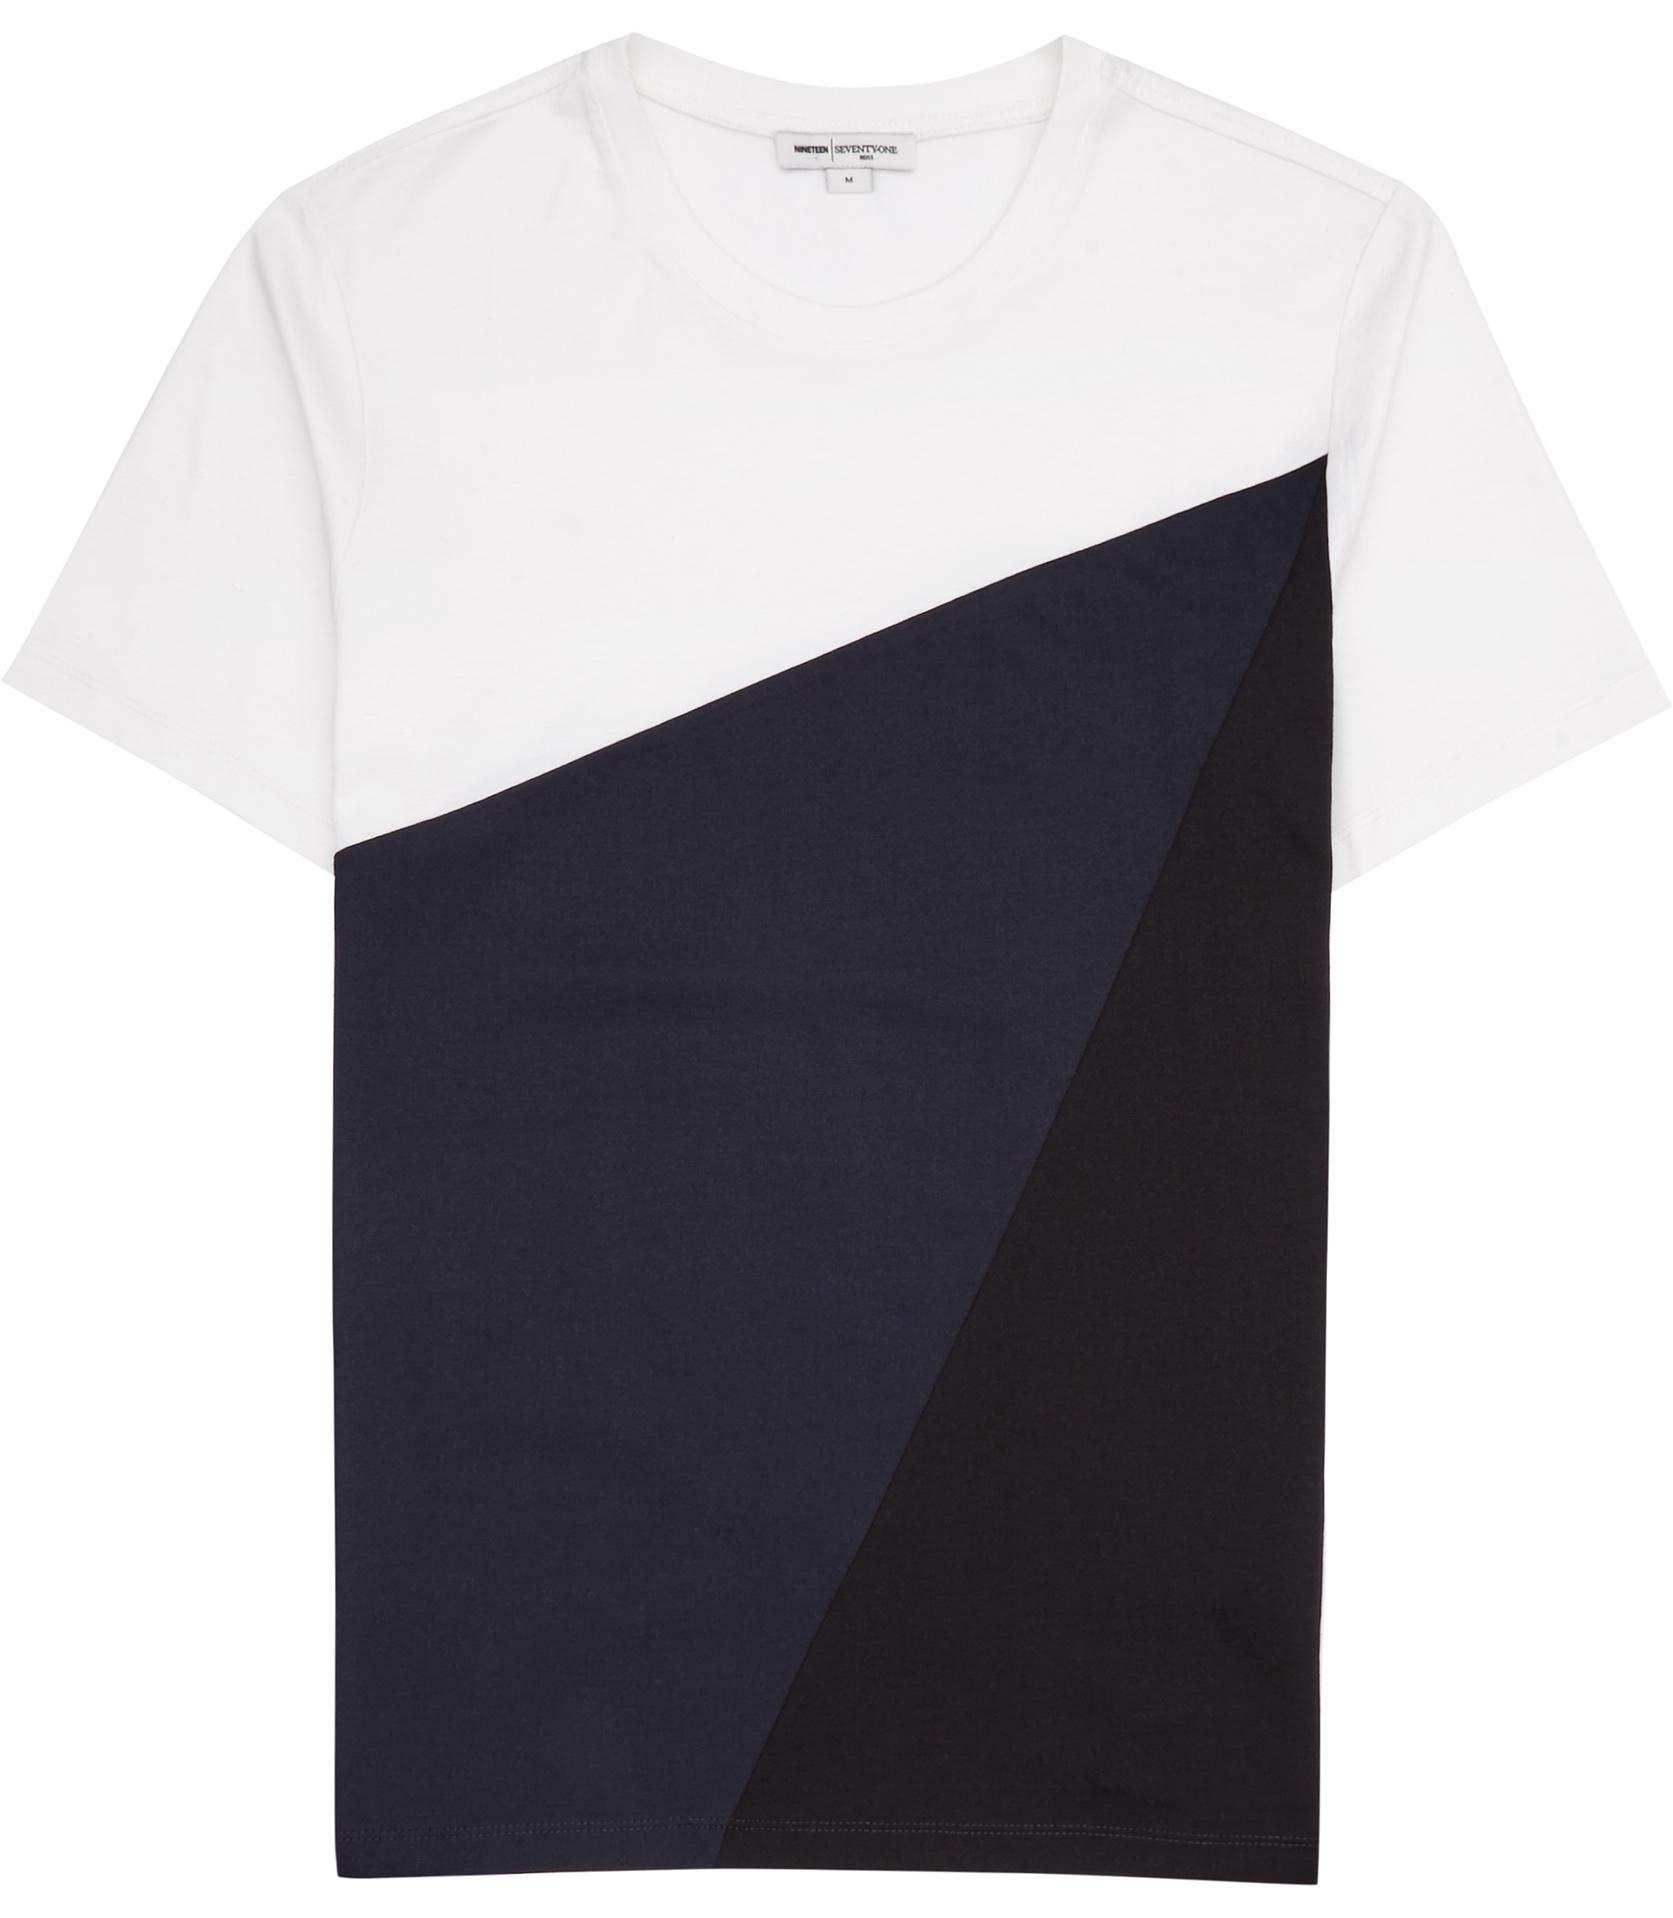 Black t shirt reiss - Gallery